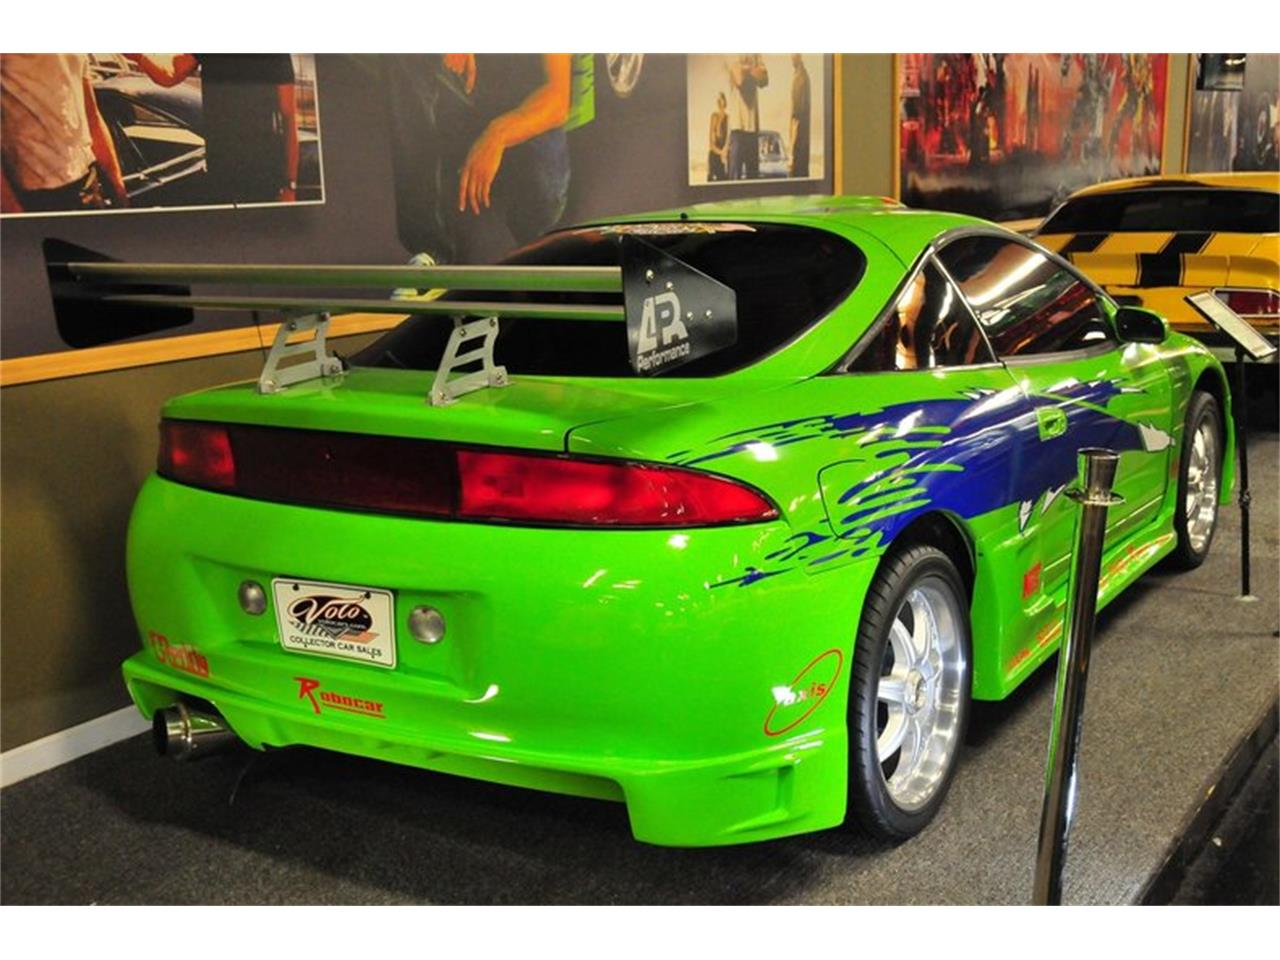 2 Dr Mitsubishi Turbo Gst Gst 1998 Eclipse Mitsubishi 1998 Eclipse